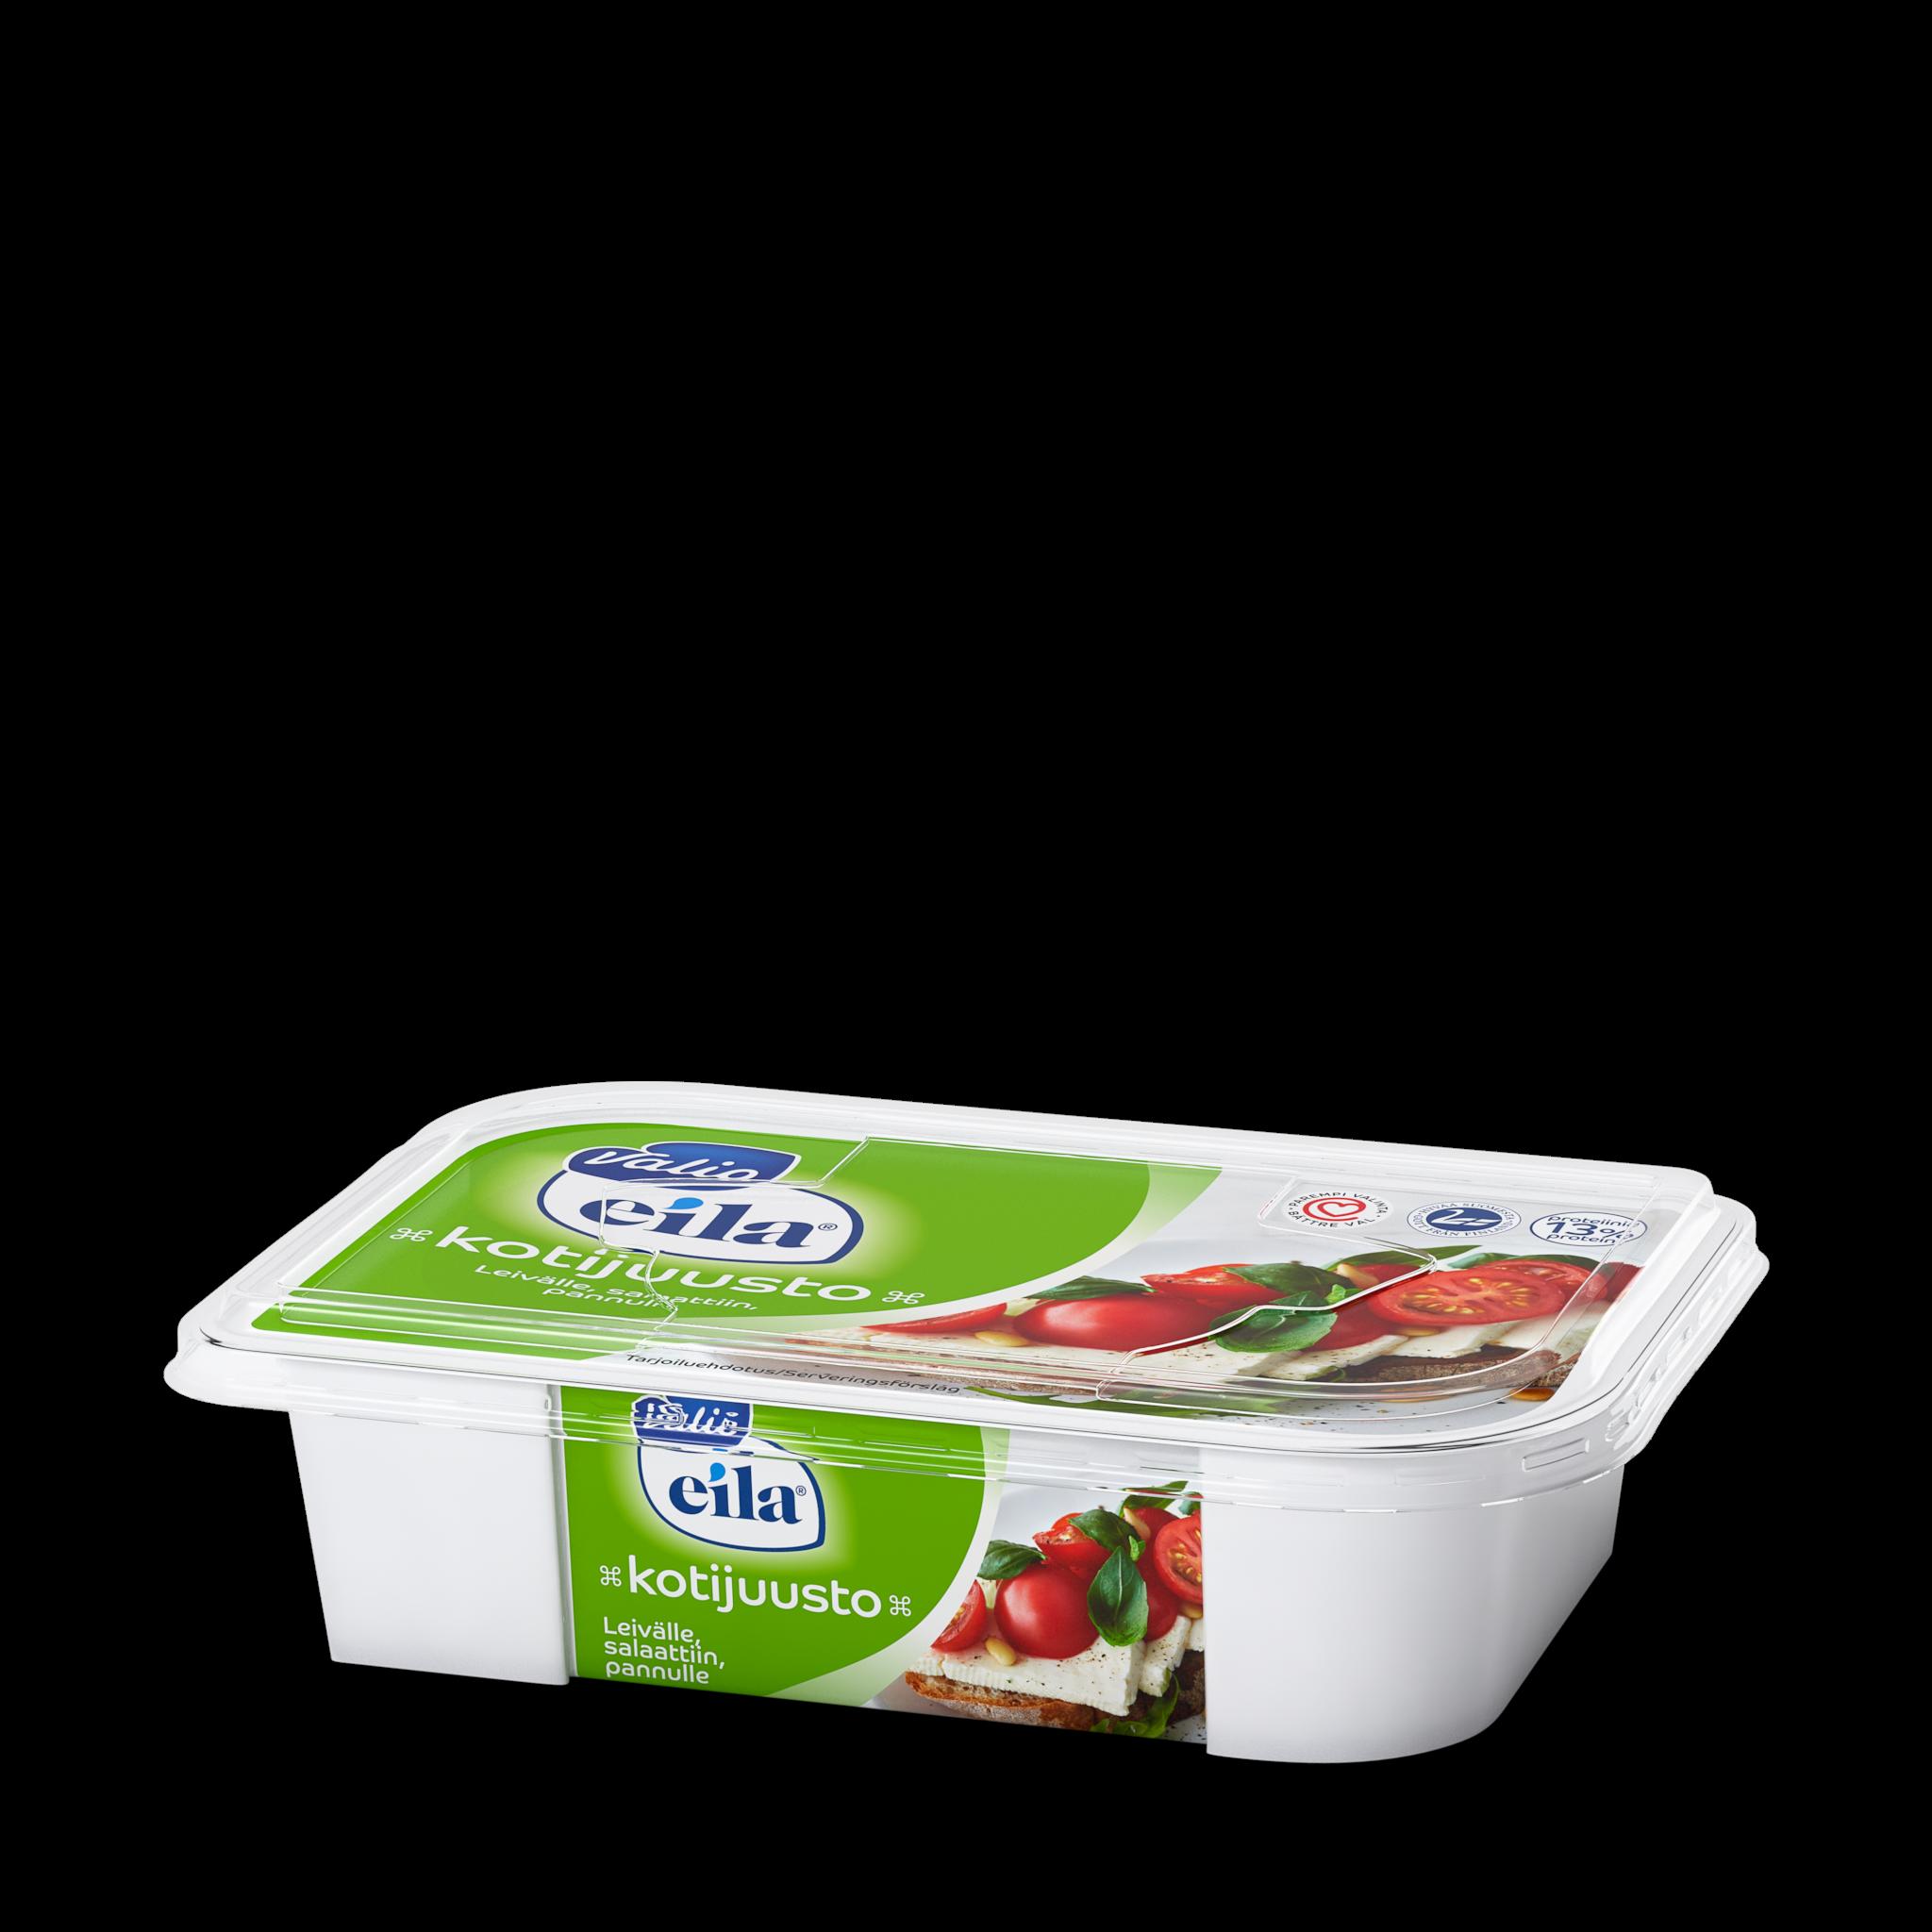 Valio Eila® kotijuusto laktoositon